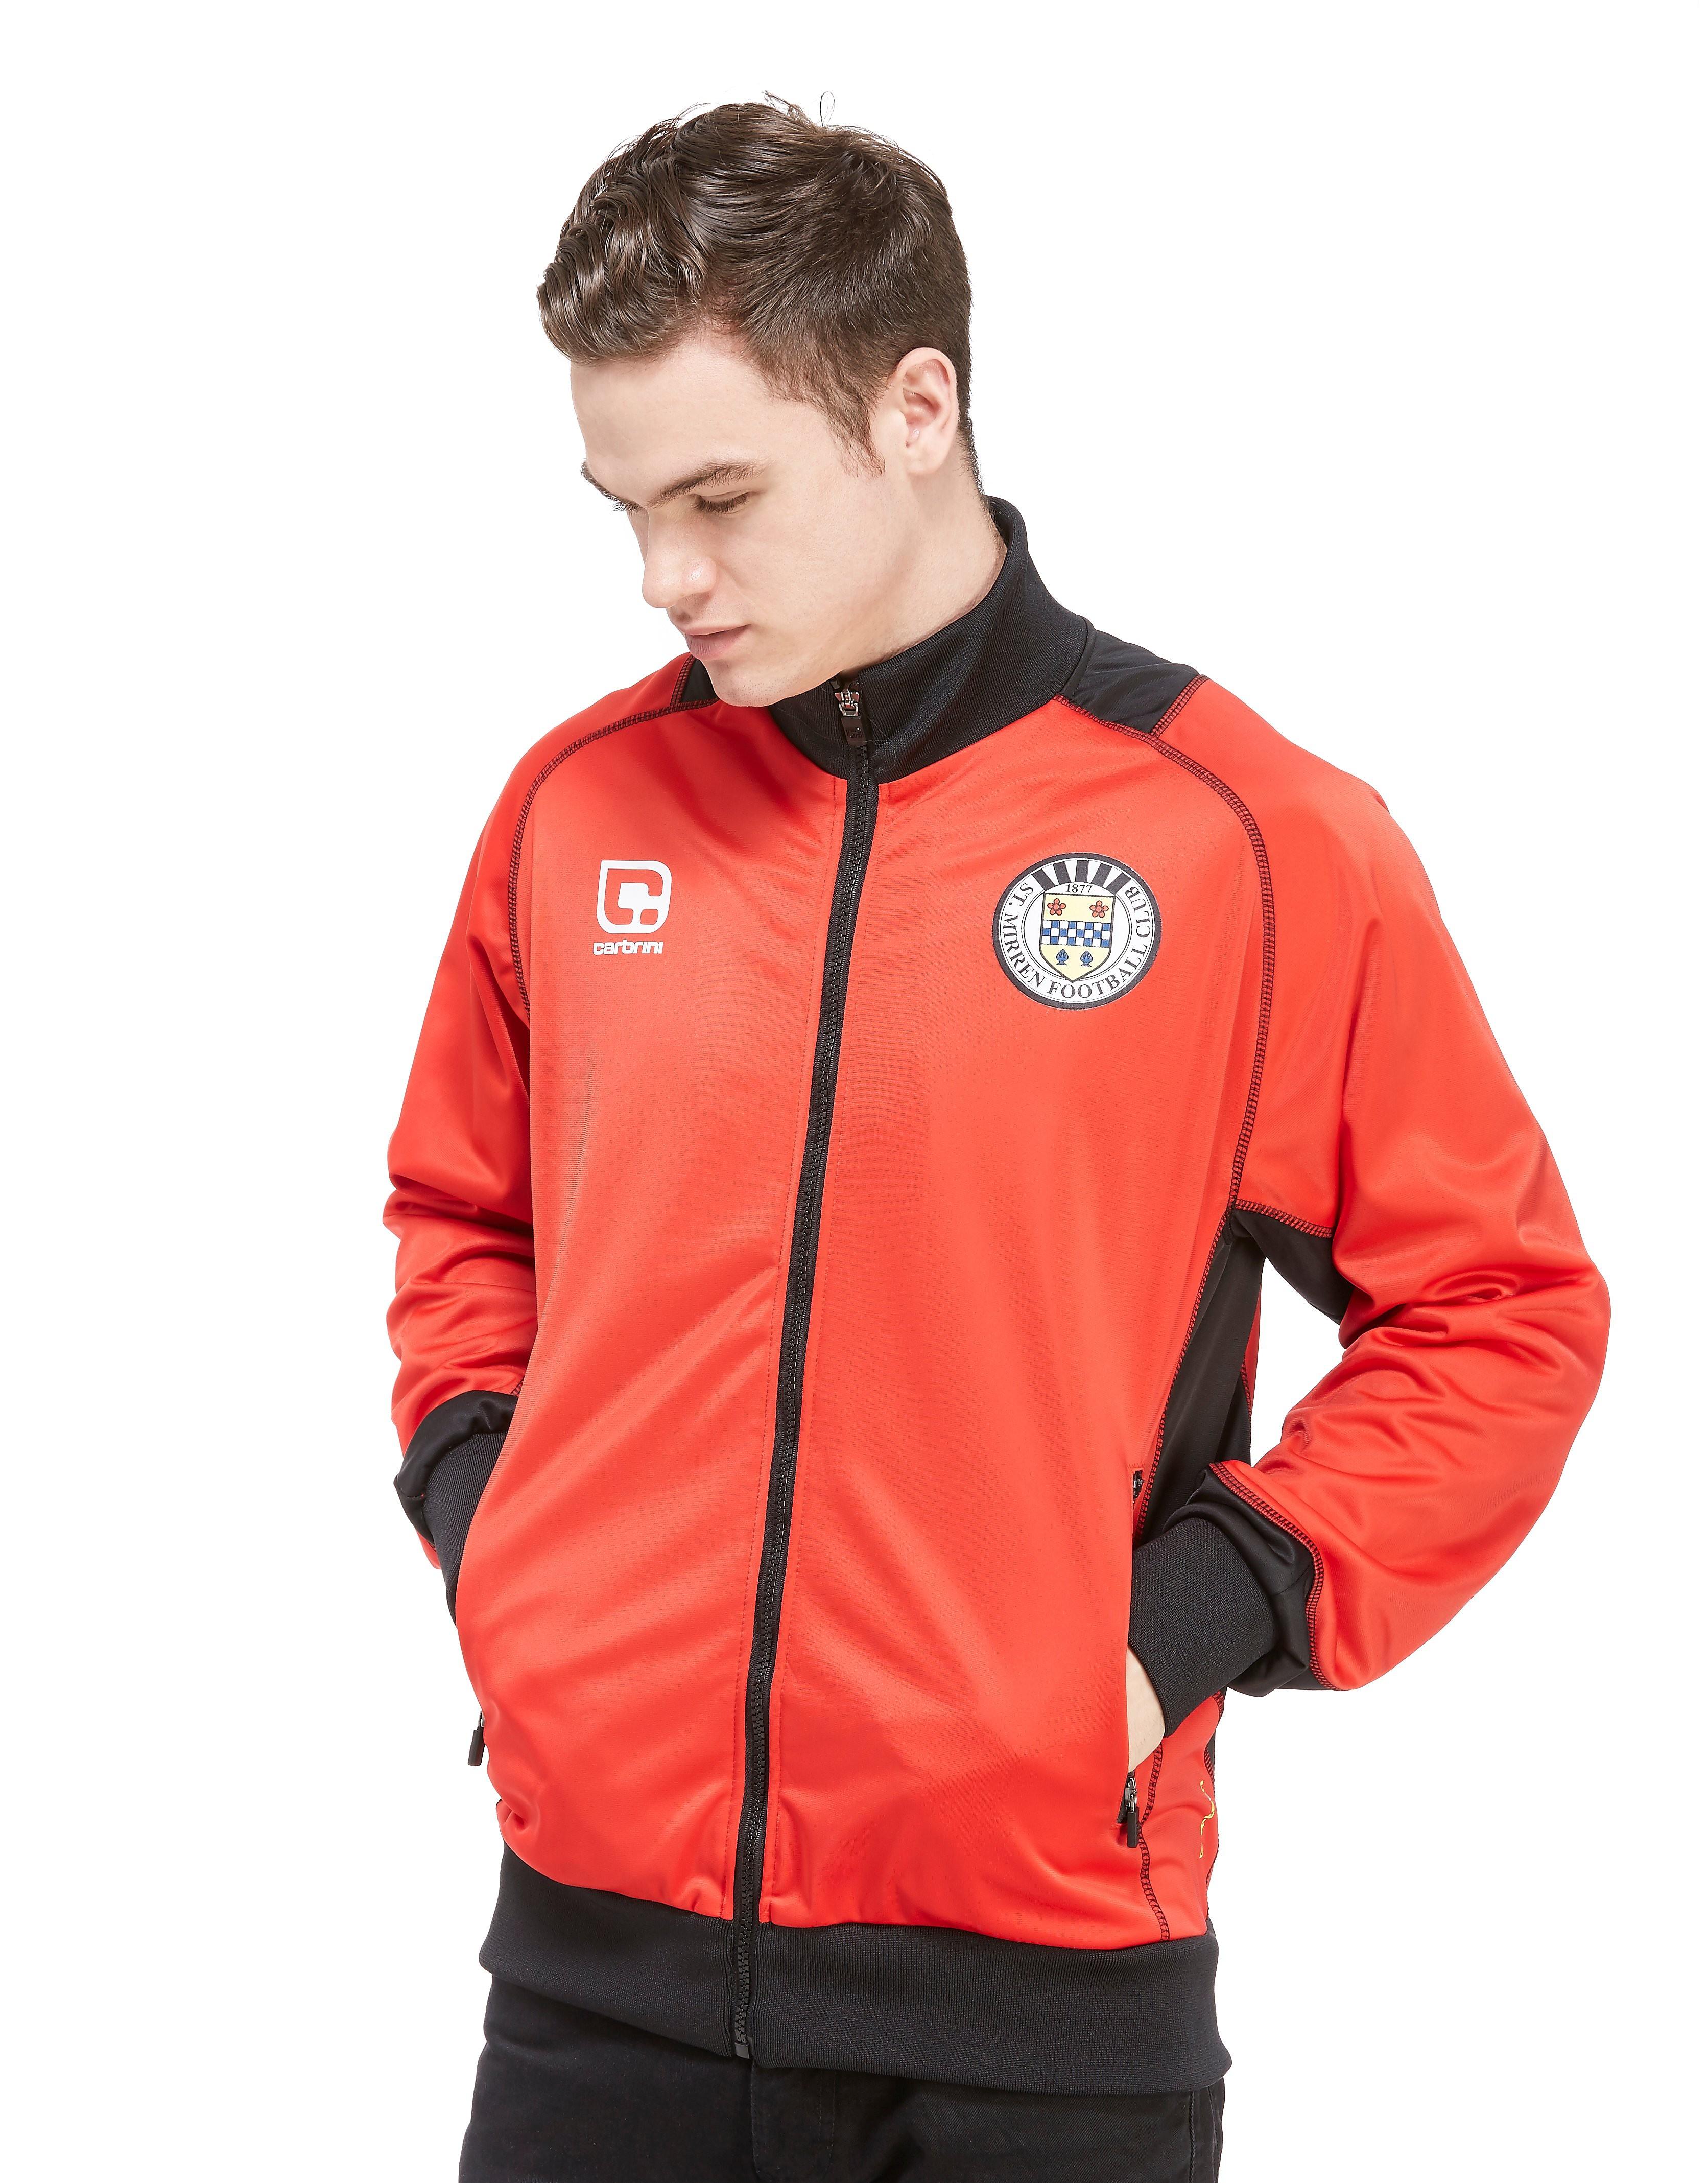 Carbrini St Mirren FC Track Jacket